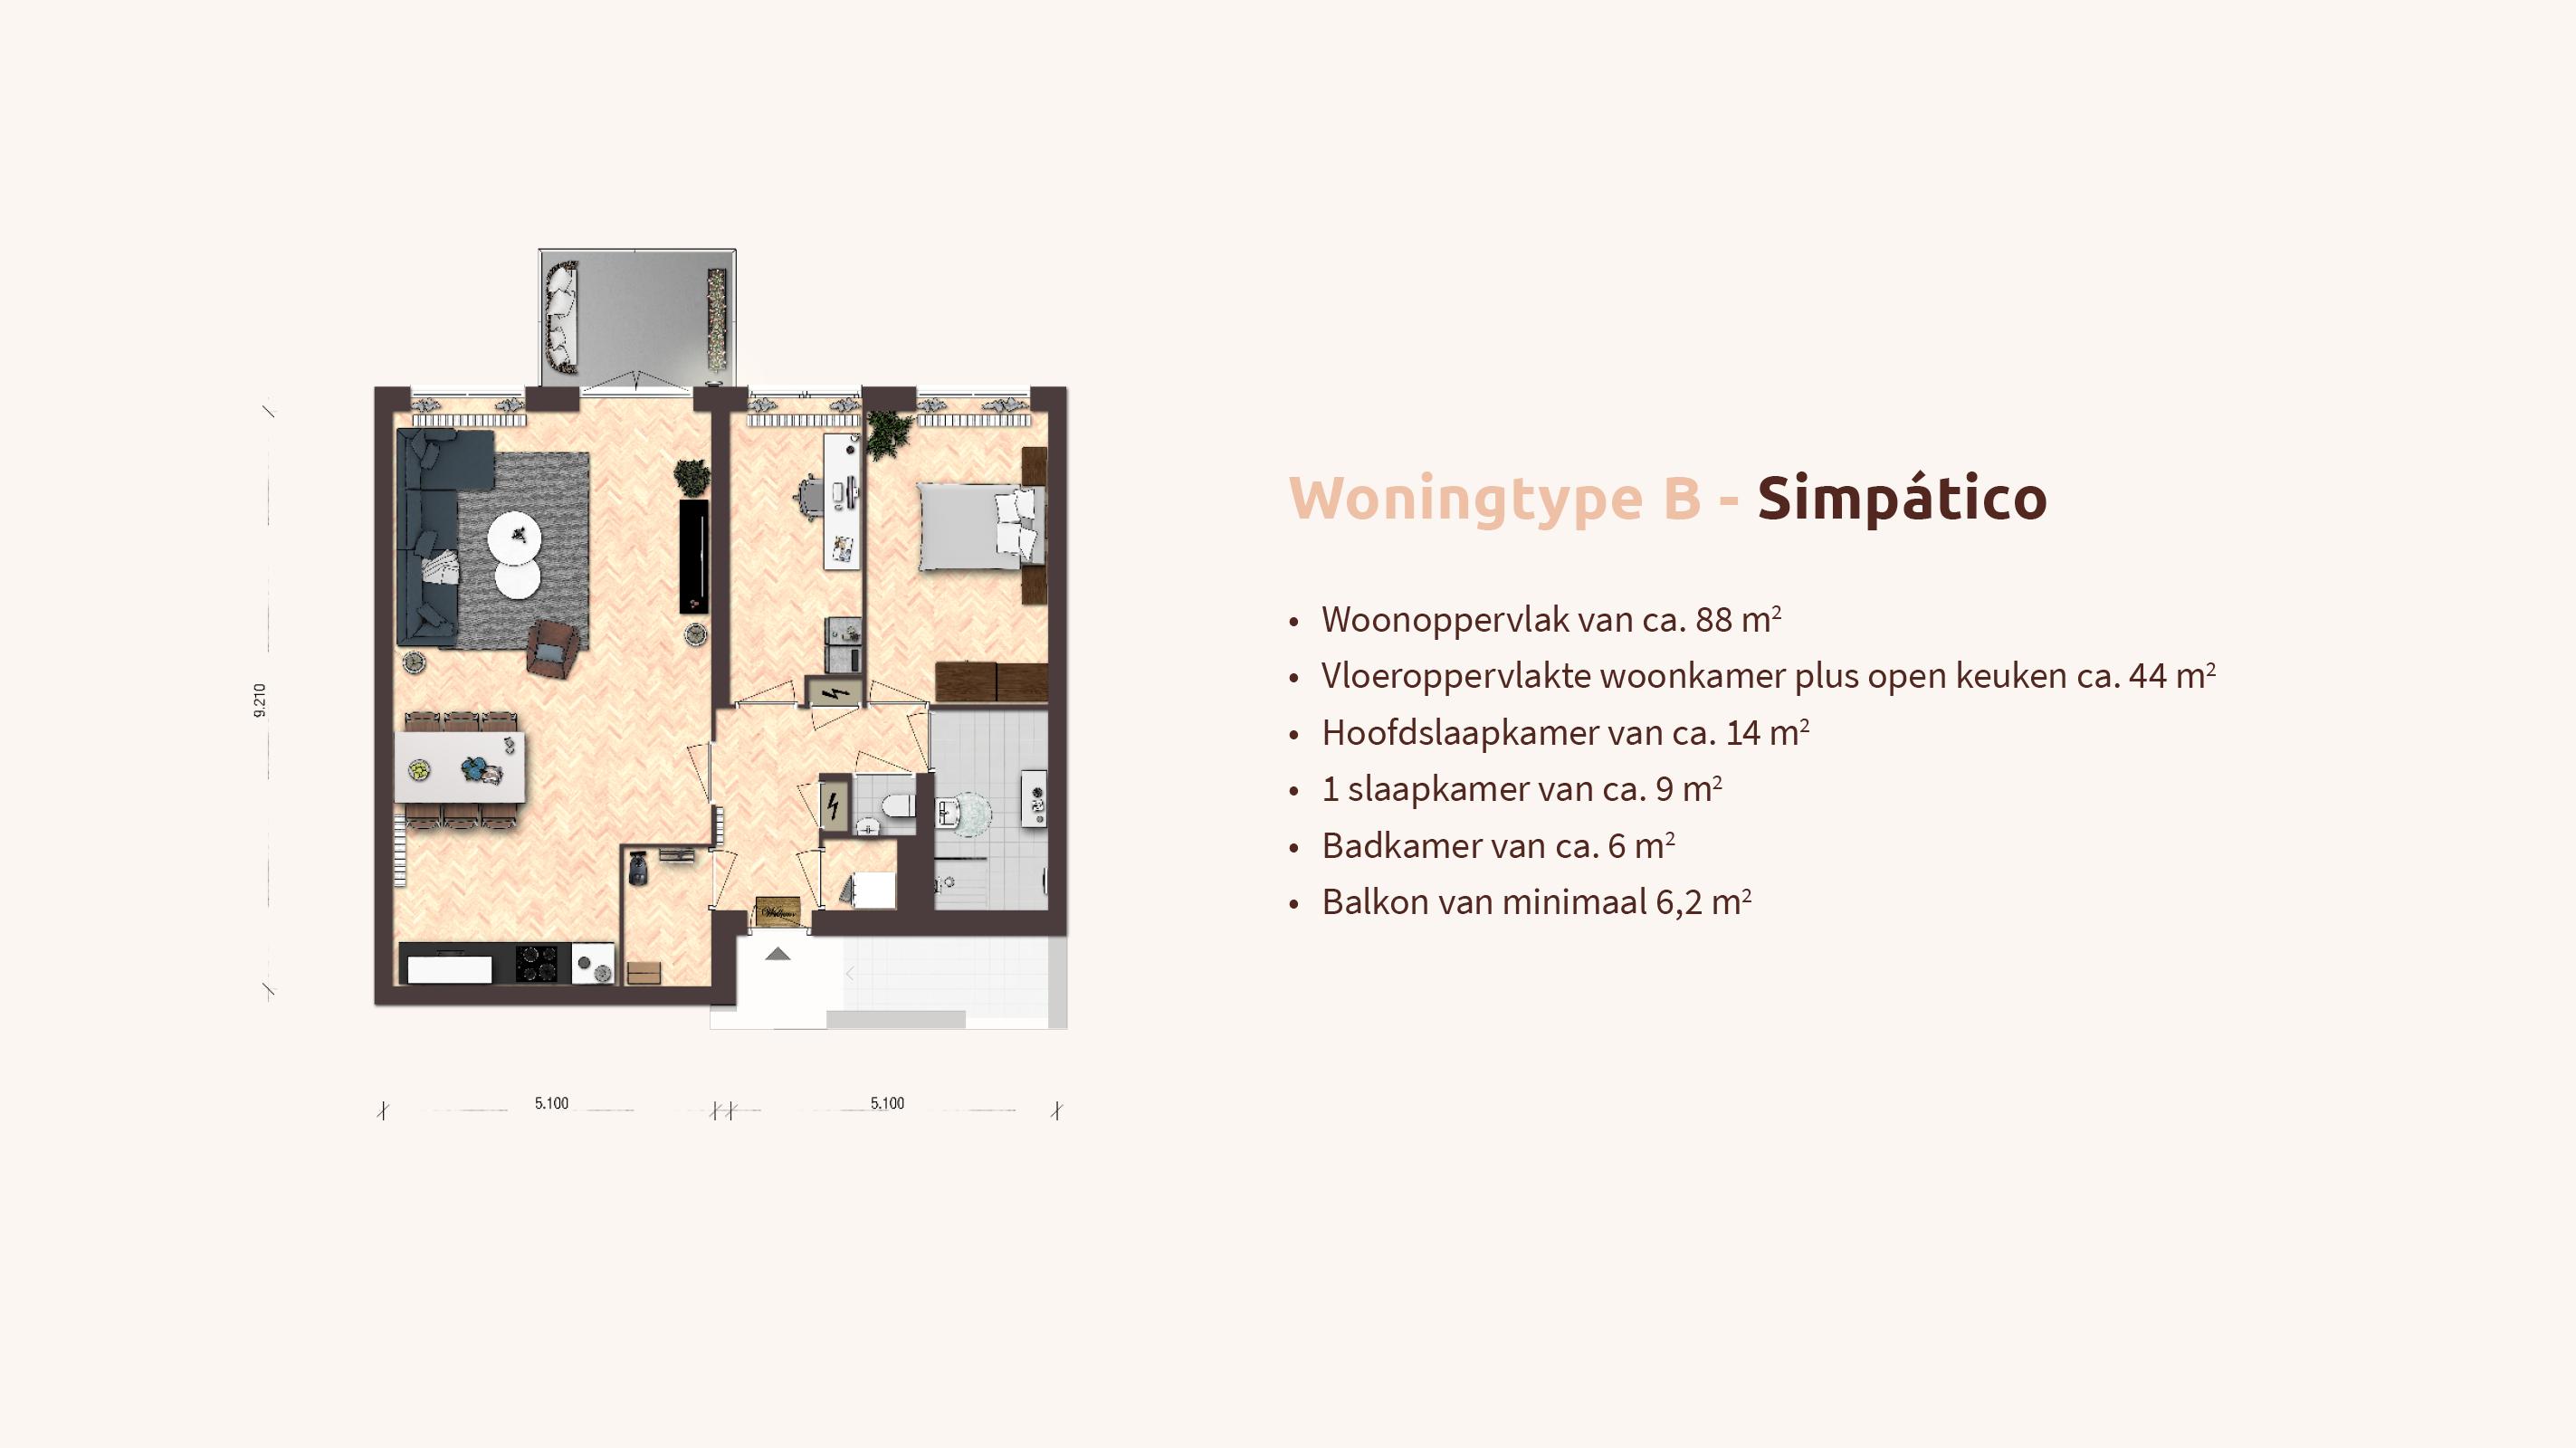 Woningtype B - Simpático - Pop-up - Appartementen Leidsche Rijn - Picaz Utrecht